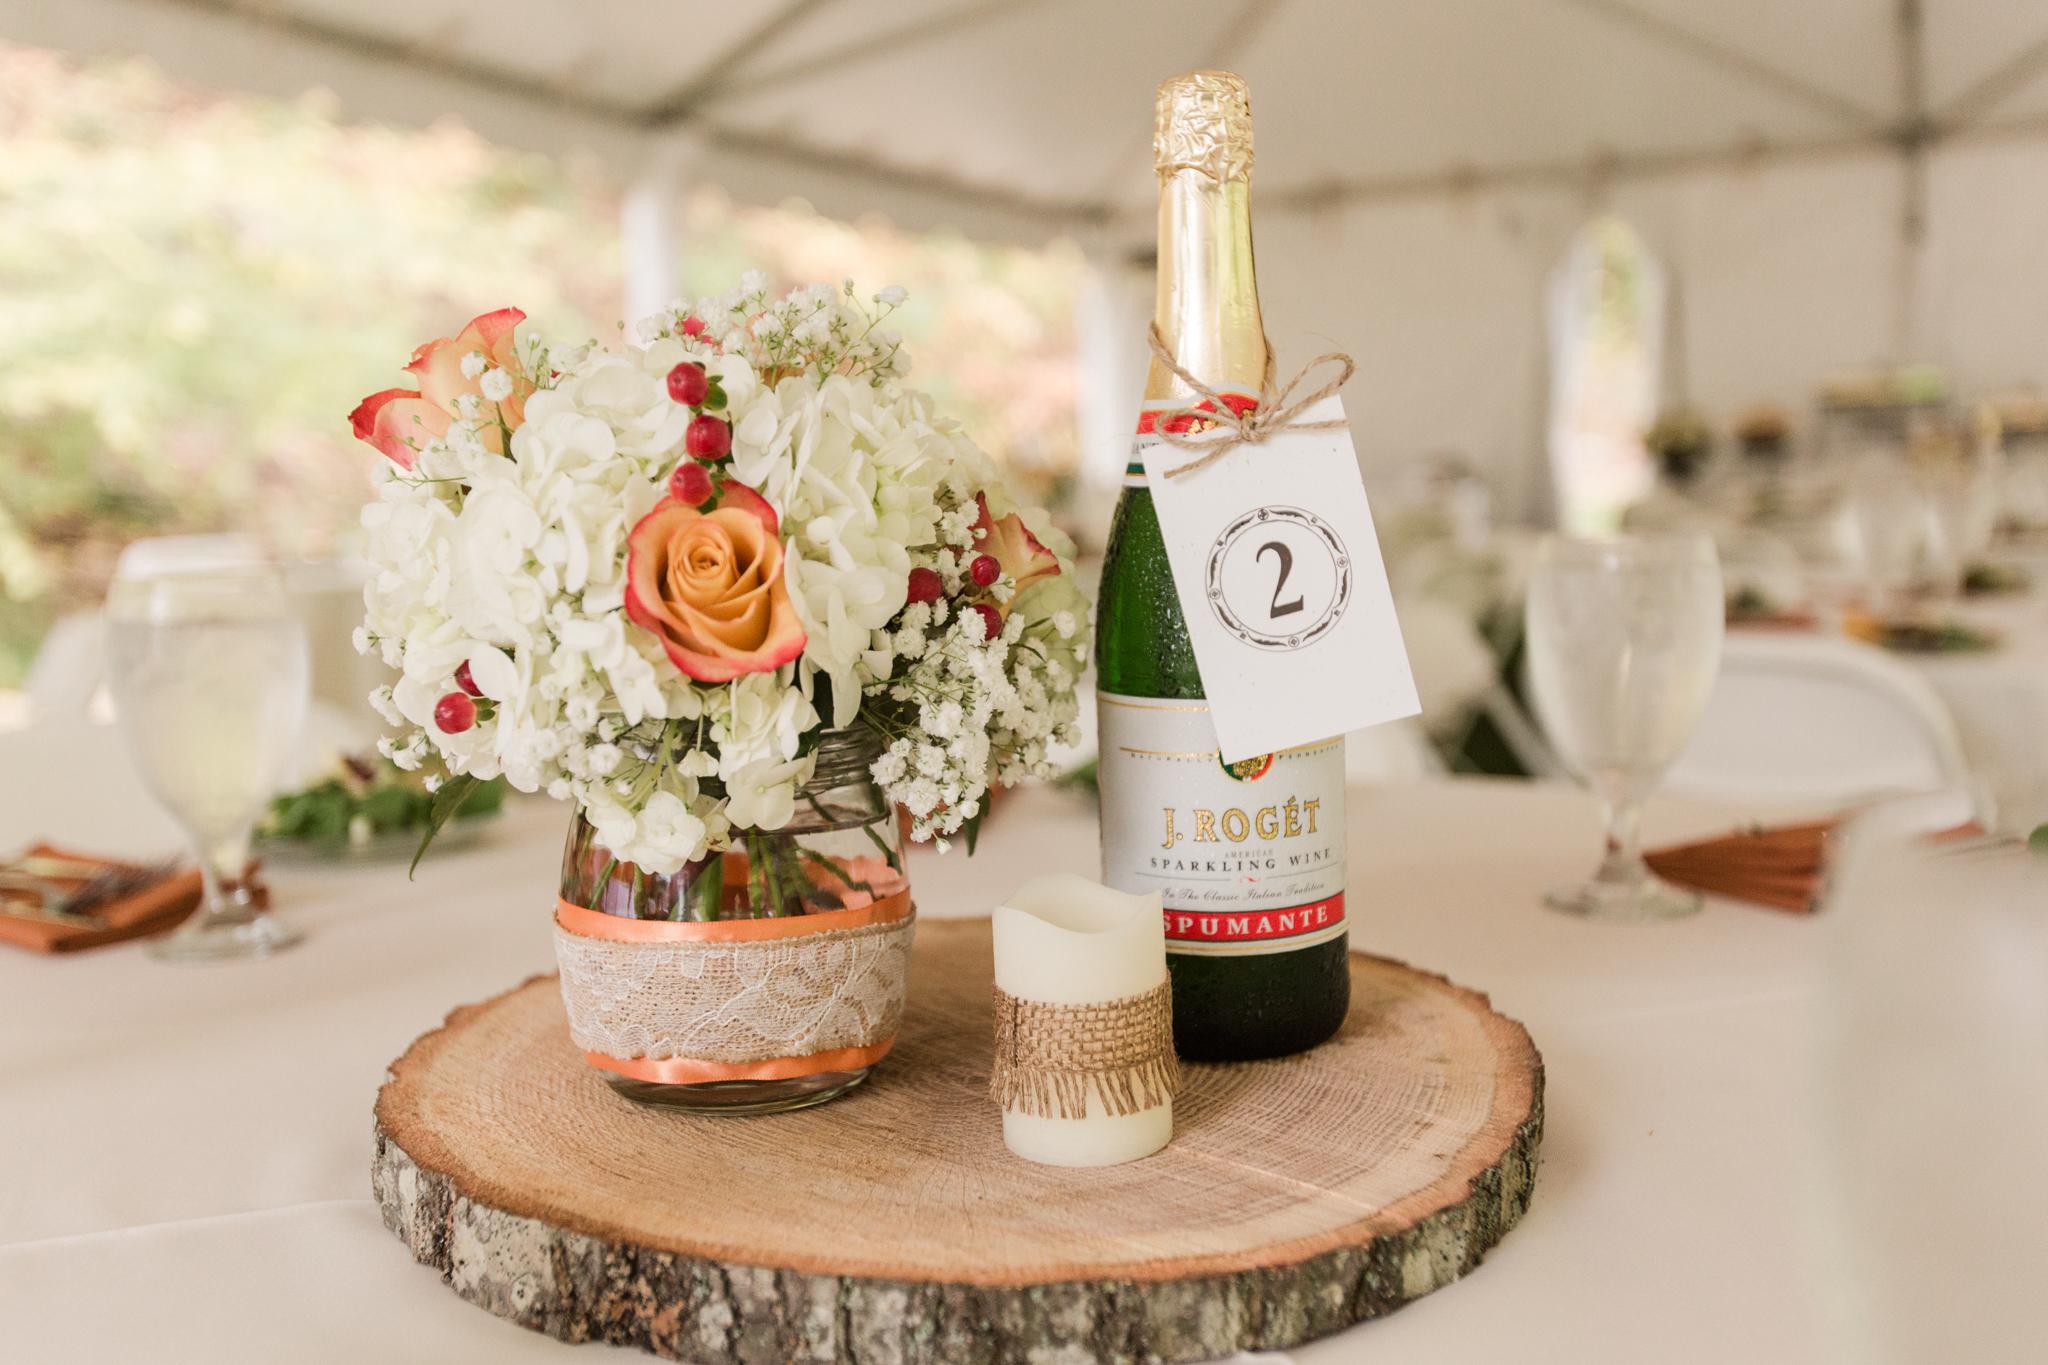 Ashley-Amber-Photo-Outdoor-Wedding-Photography-174250.jpg